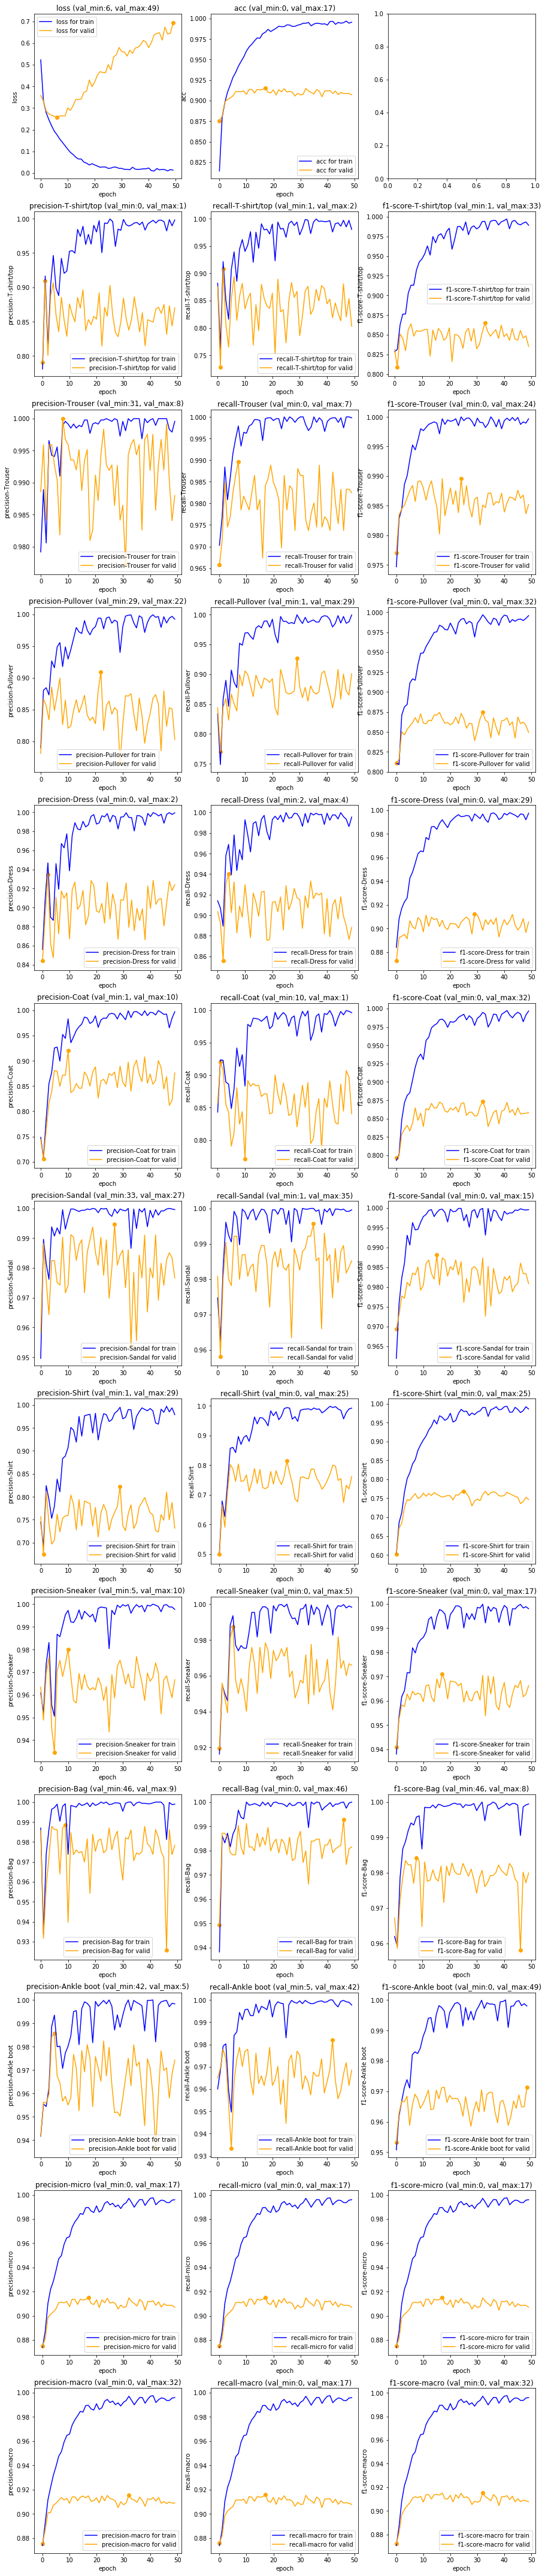 keras_graph.png